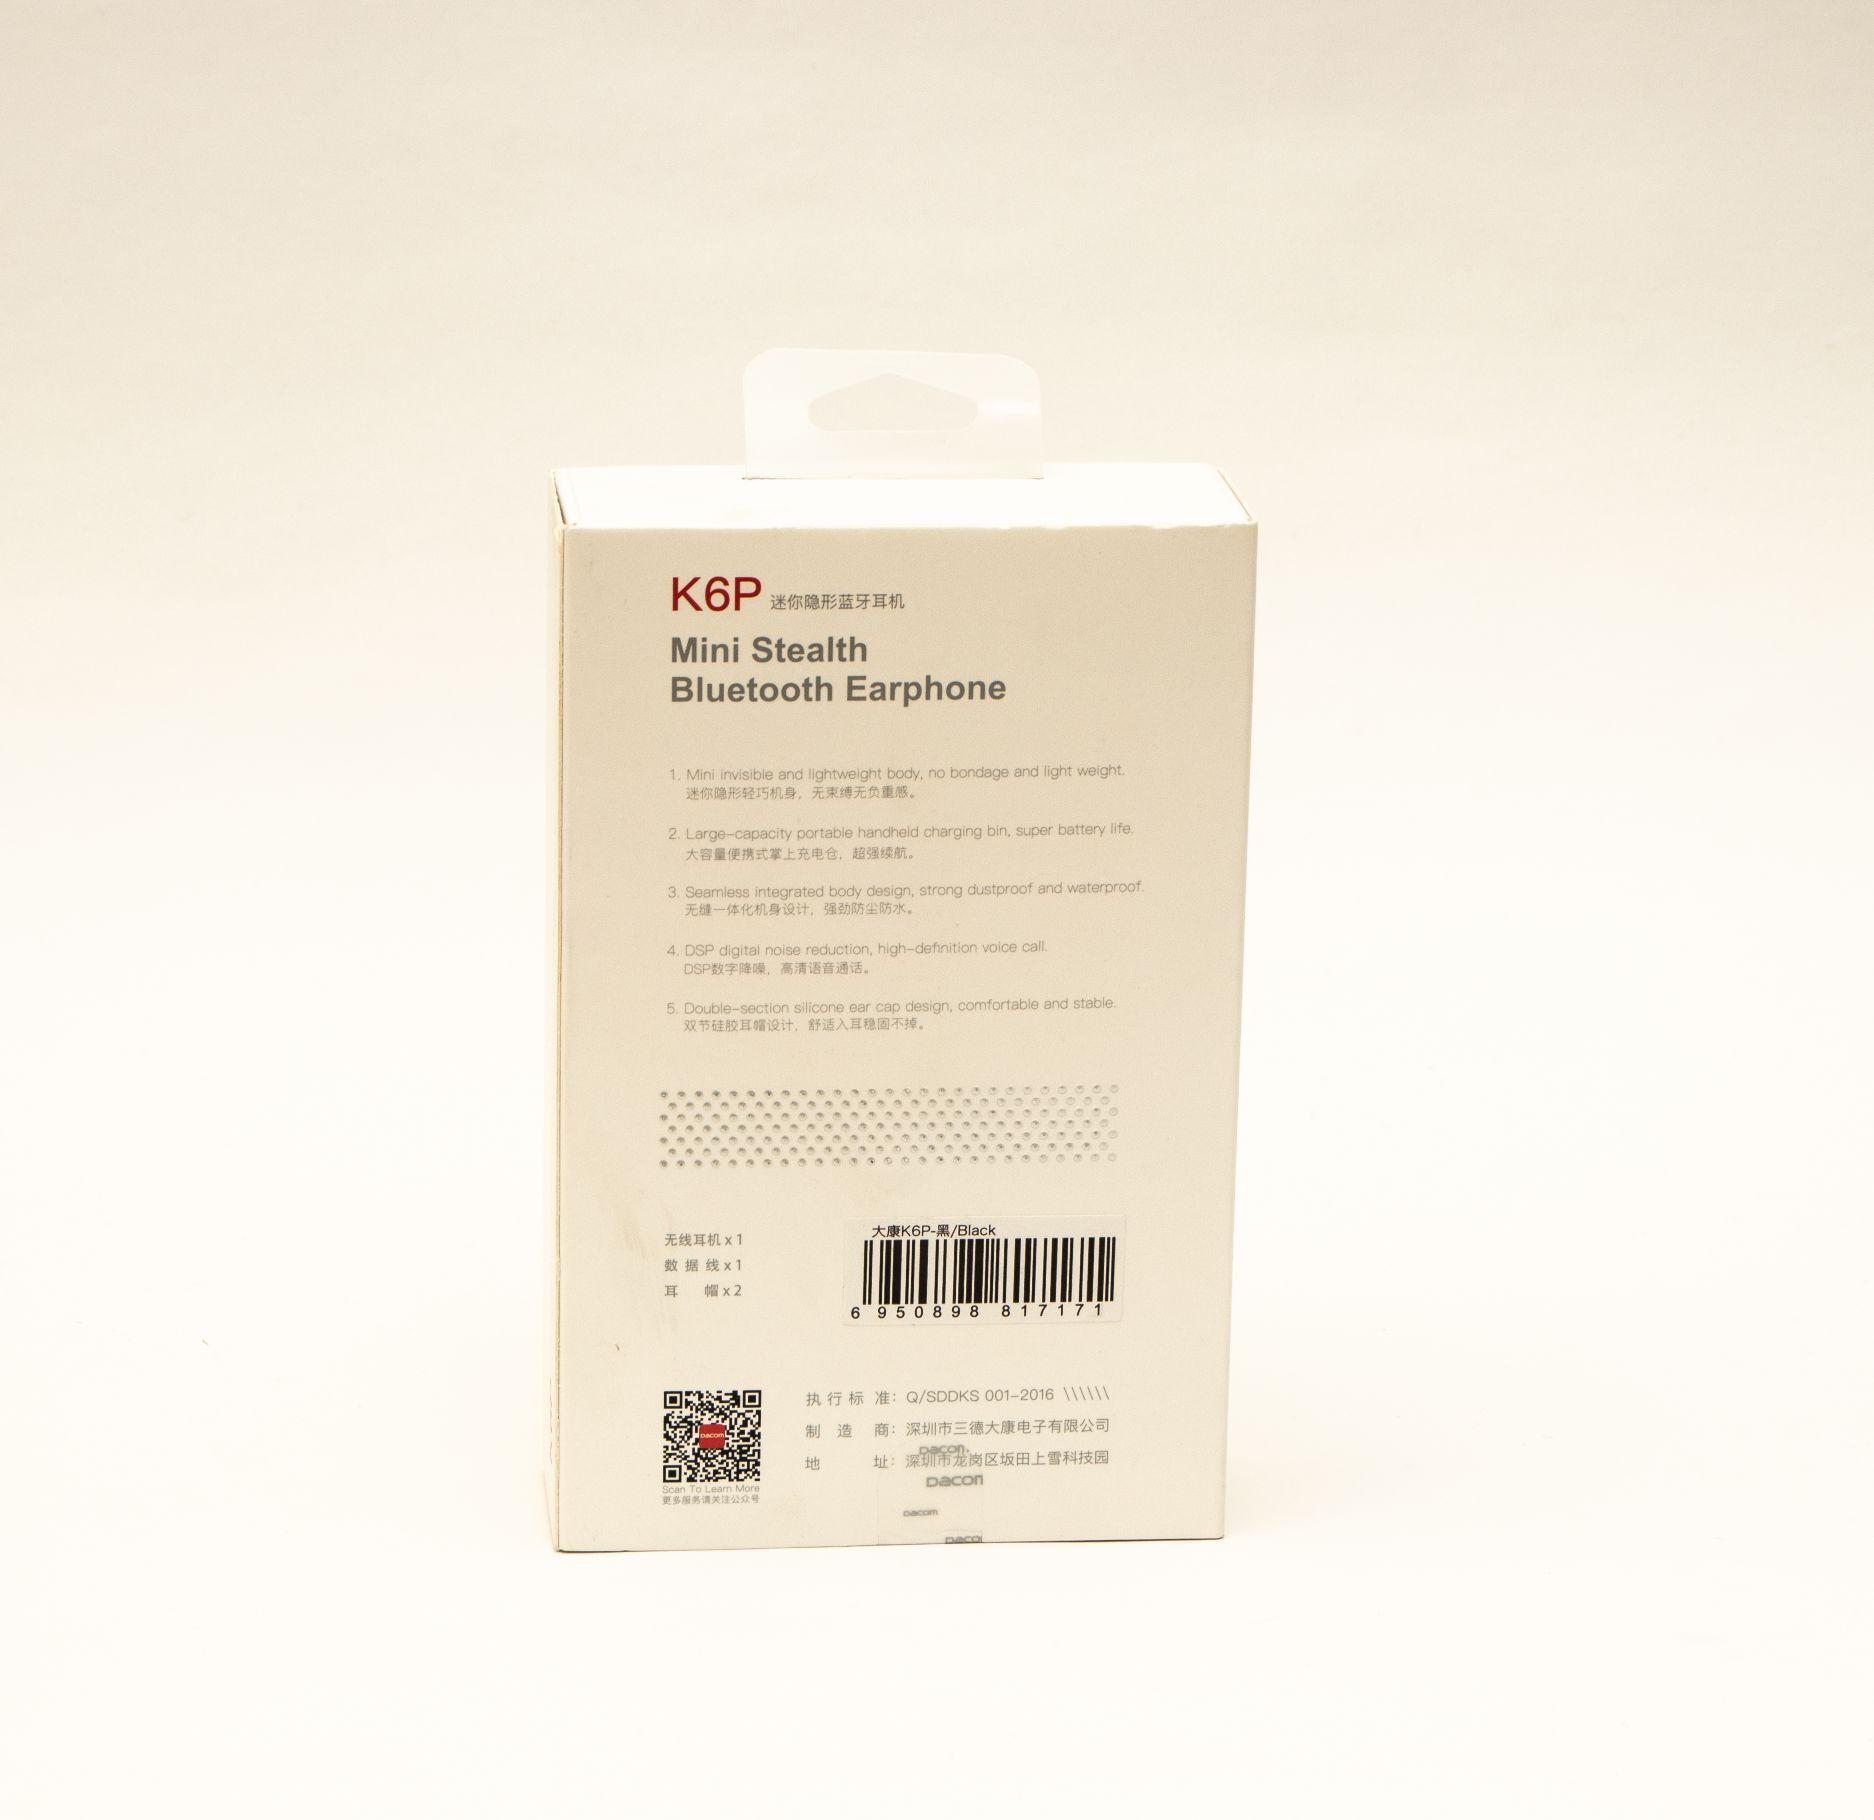 Earbuds Dacom K6p One Ear Black بسعر 520ج بدل من 675ج Bluetooth Earphones Phone Accessories Bluetooth